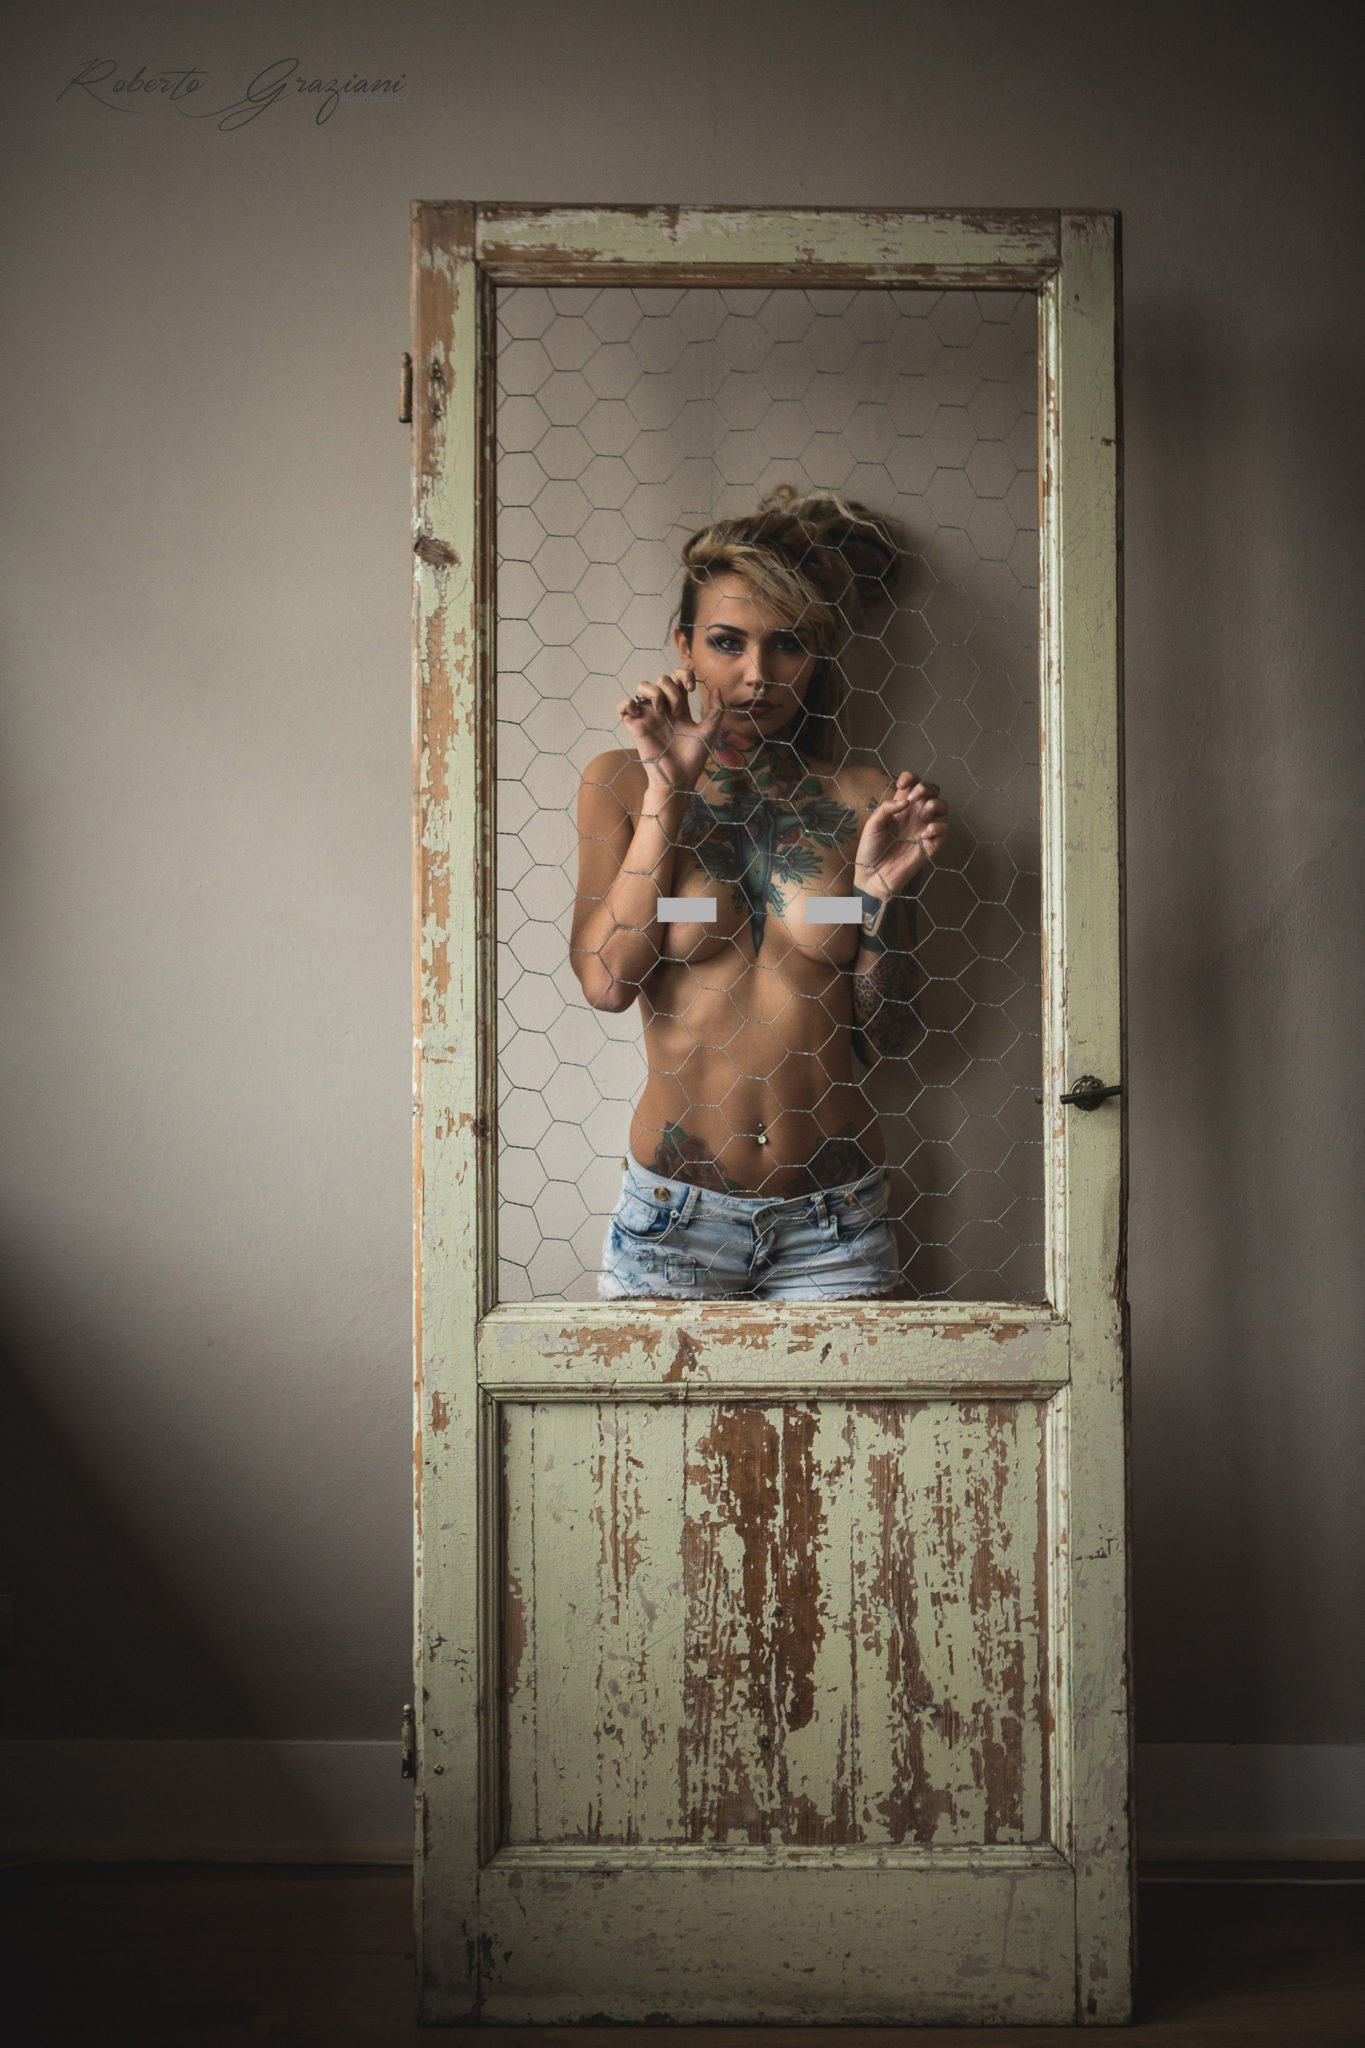 felisja-piana-eros-fishball-suicidegirl-porta